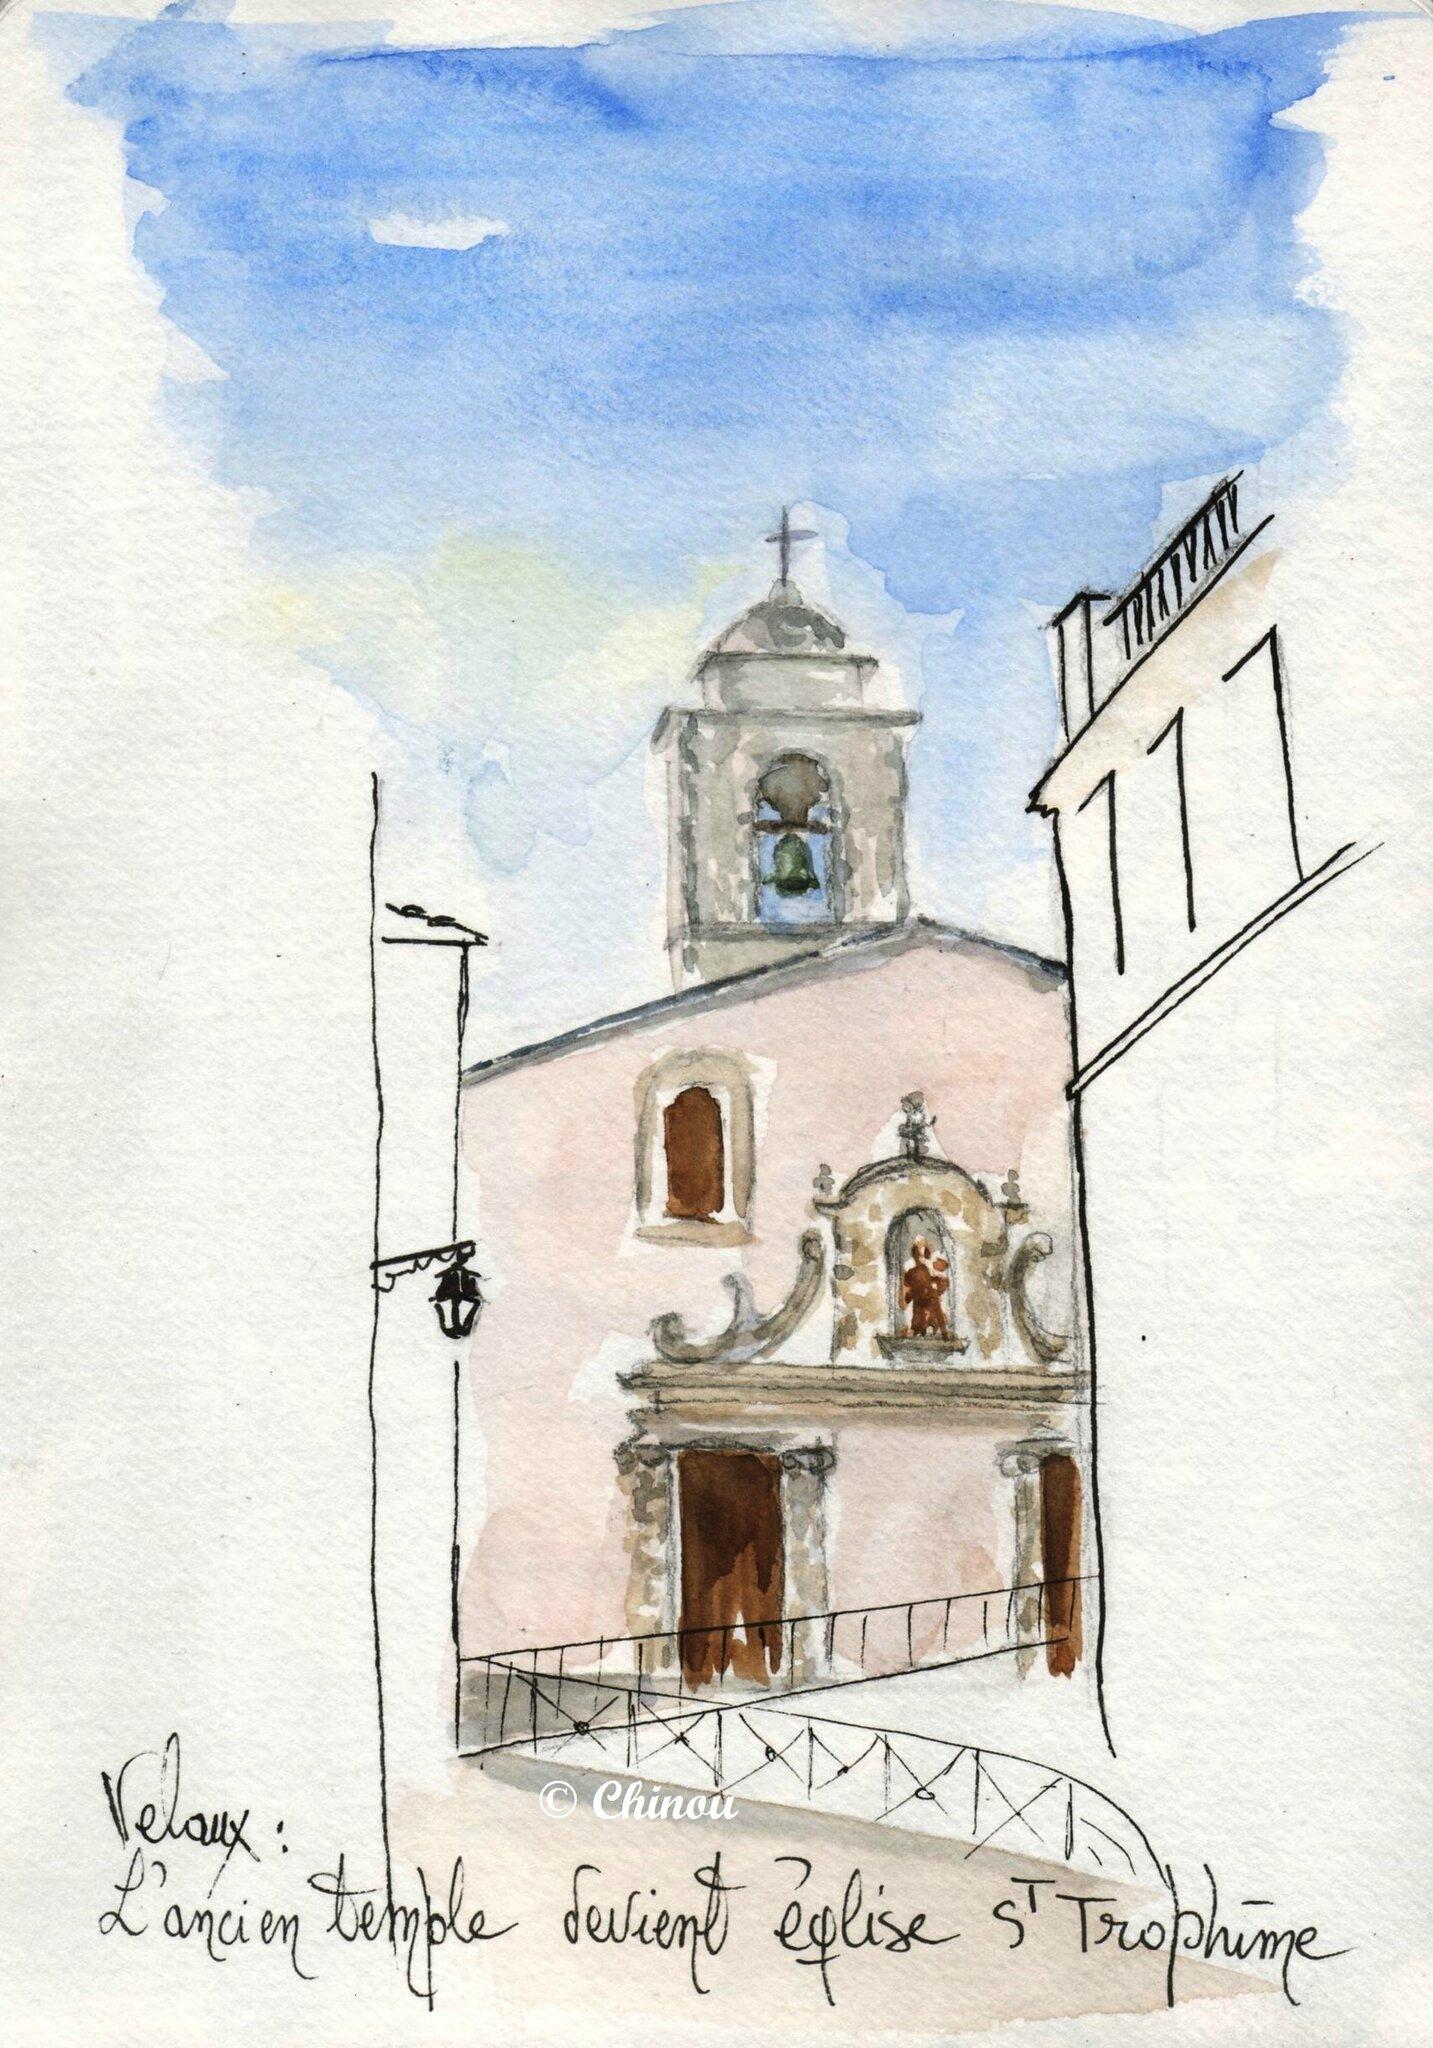 24 Eglise St Trophime